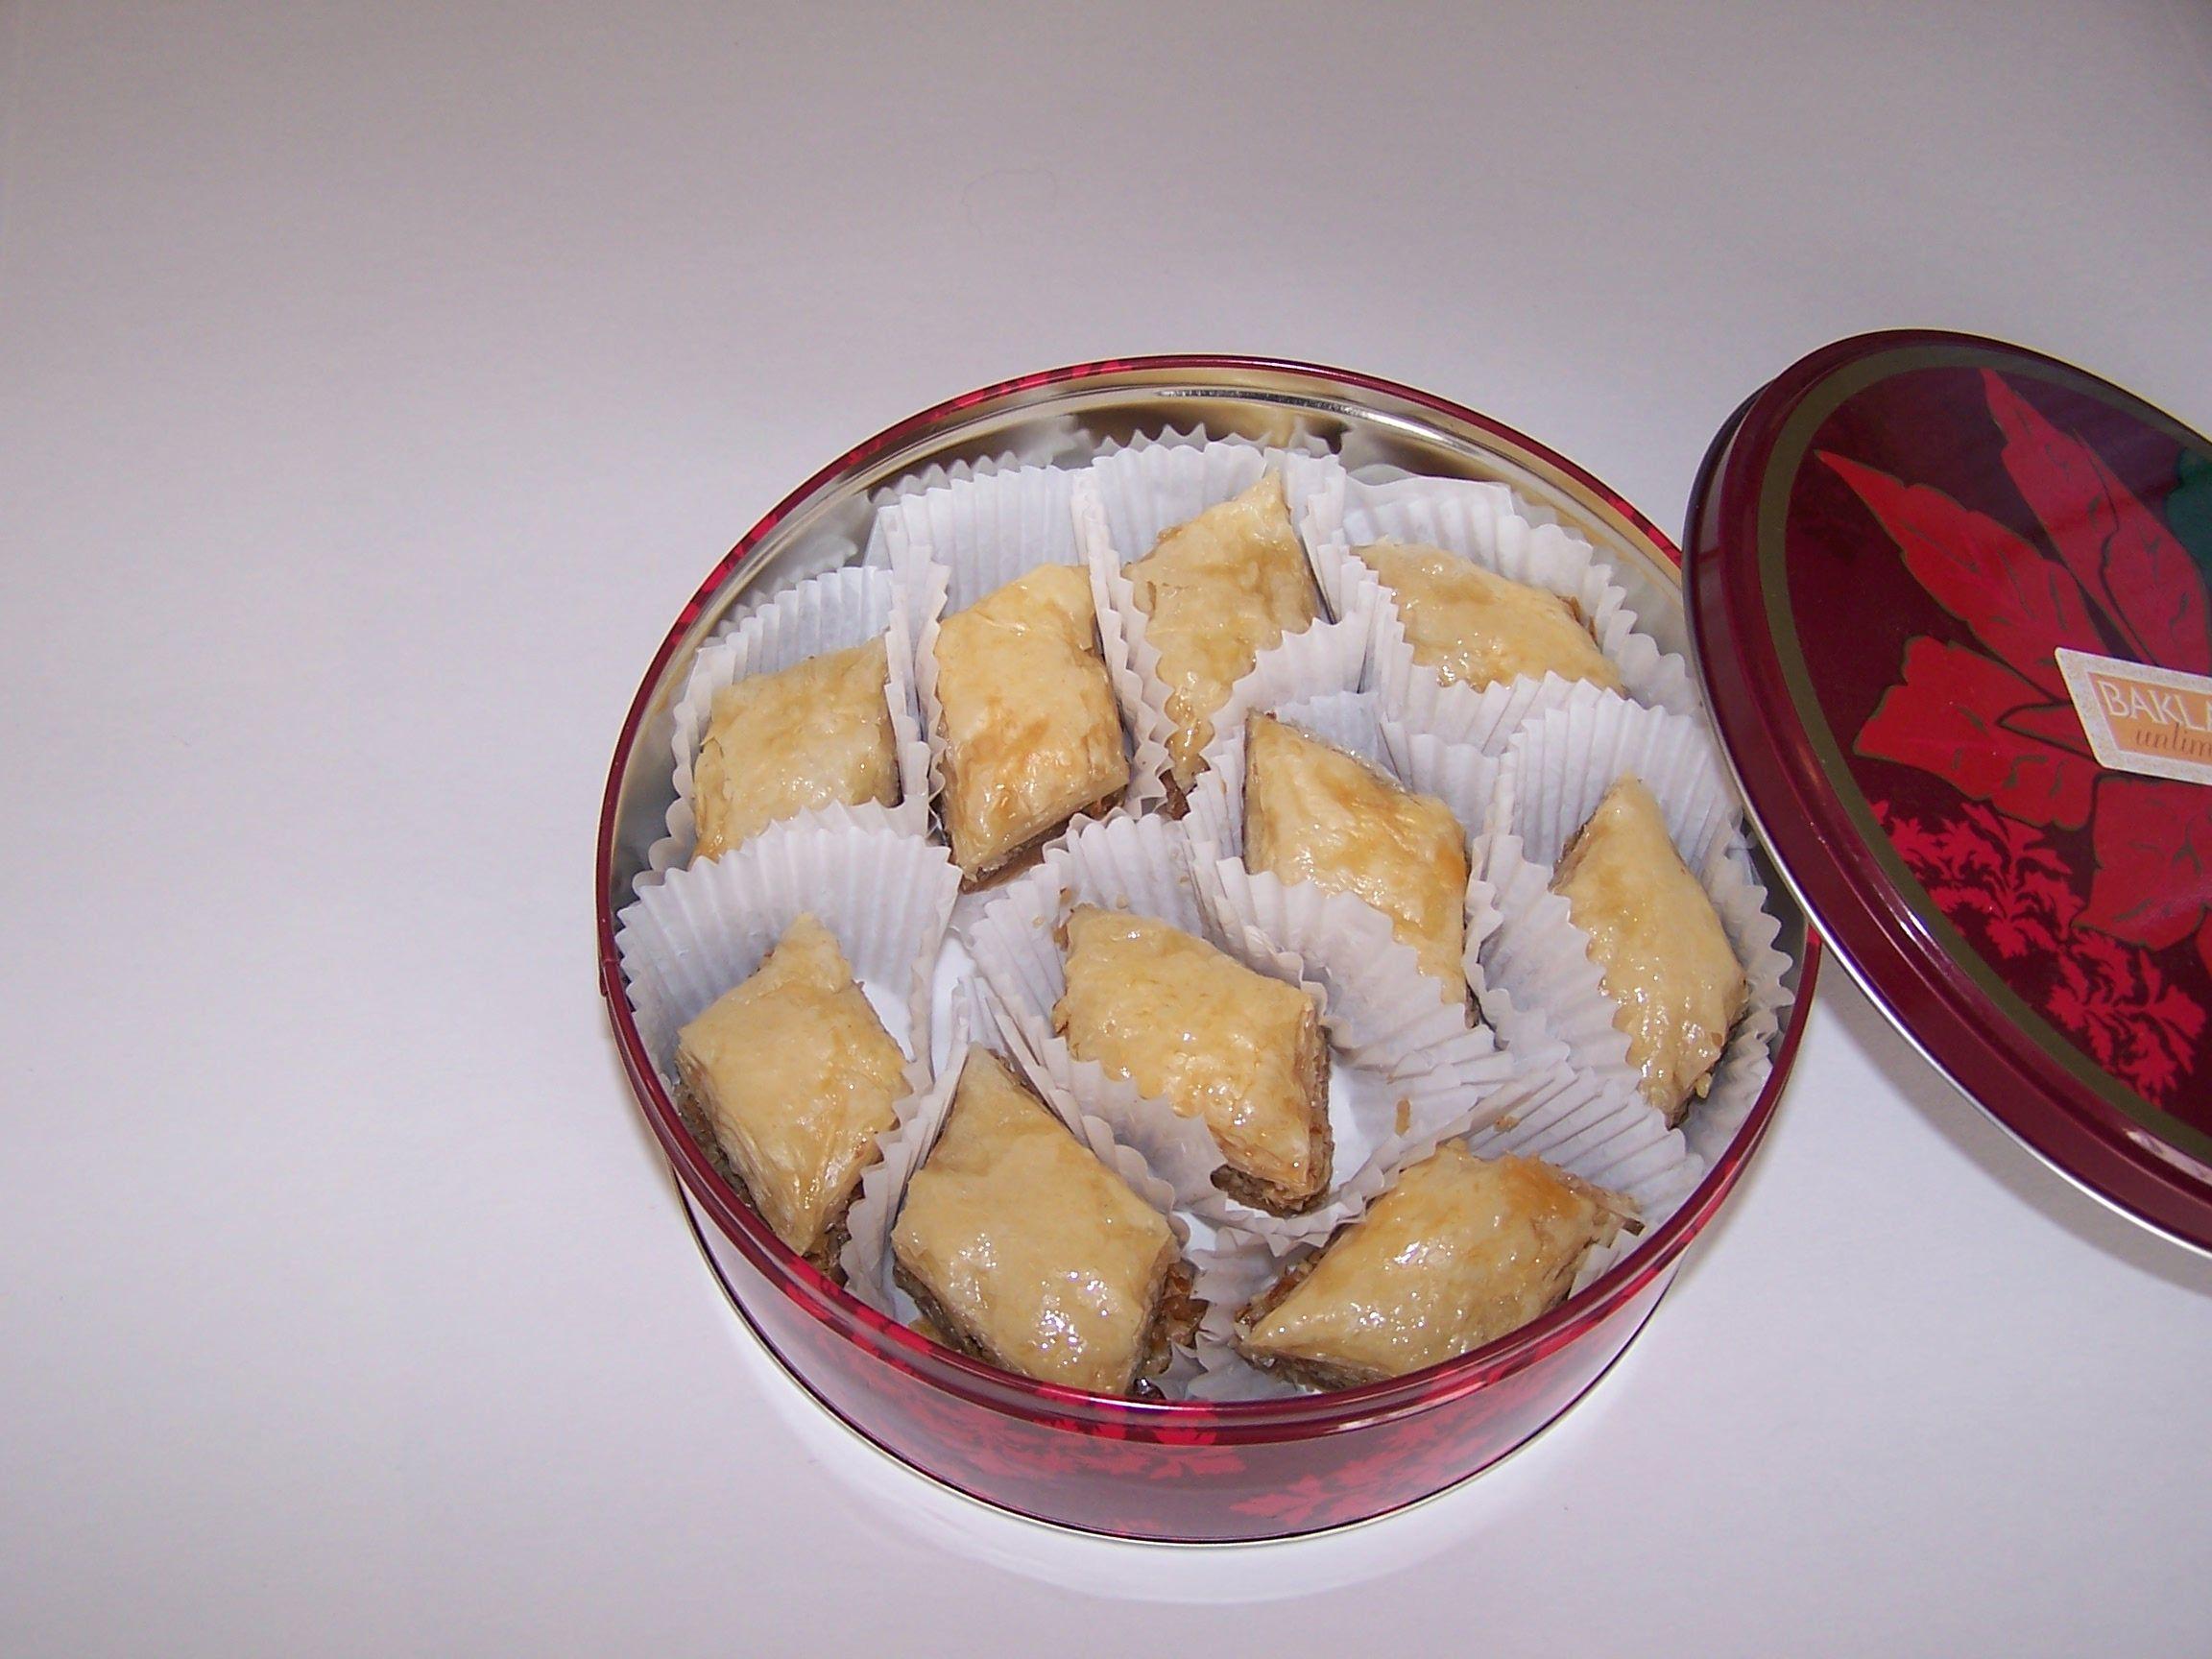 small tin of plain baklava